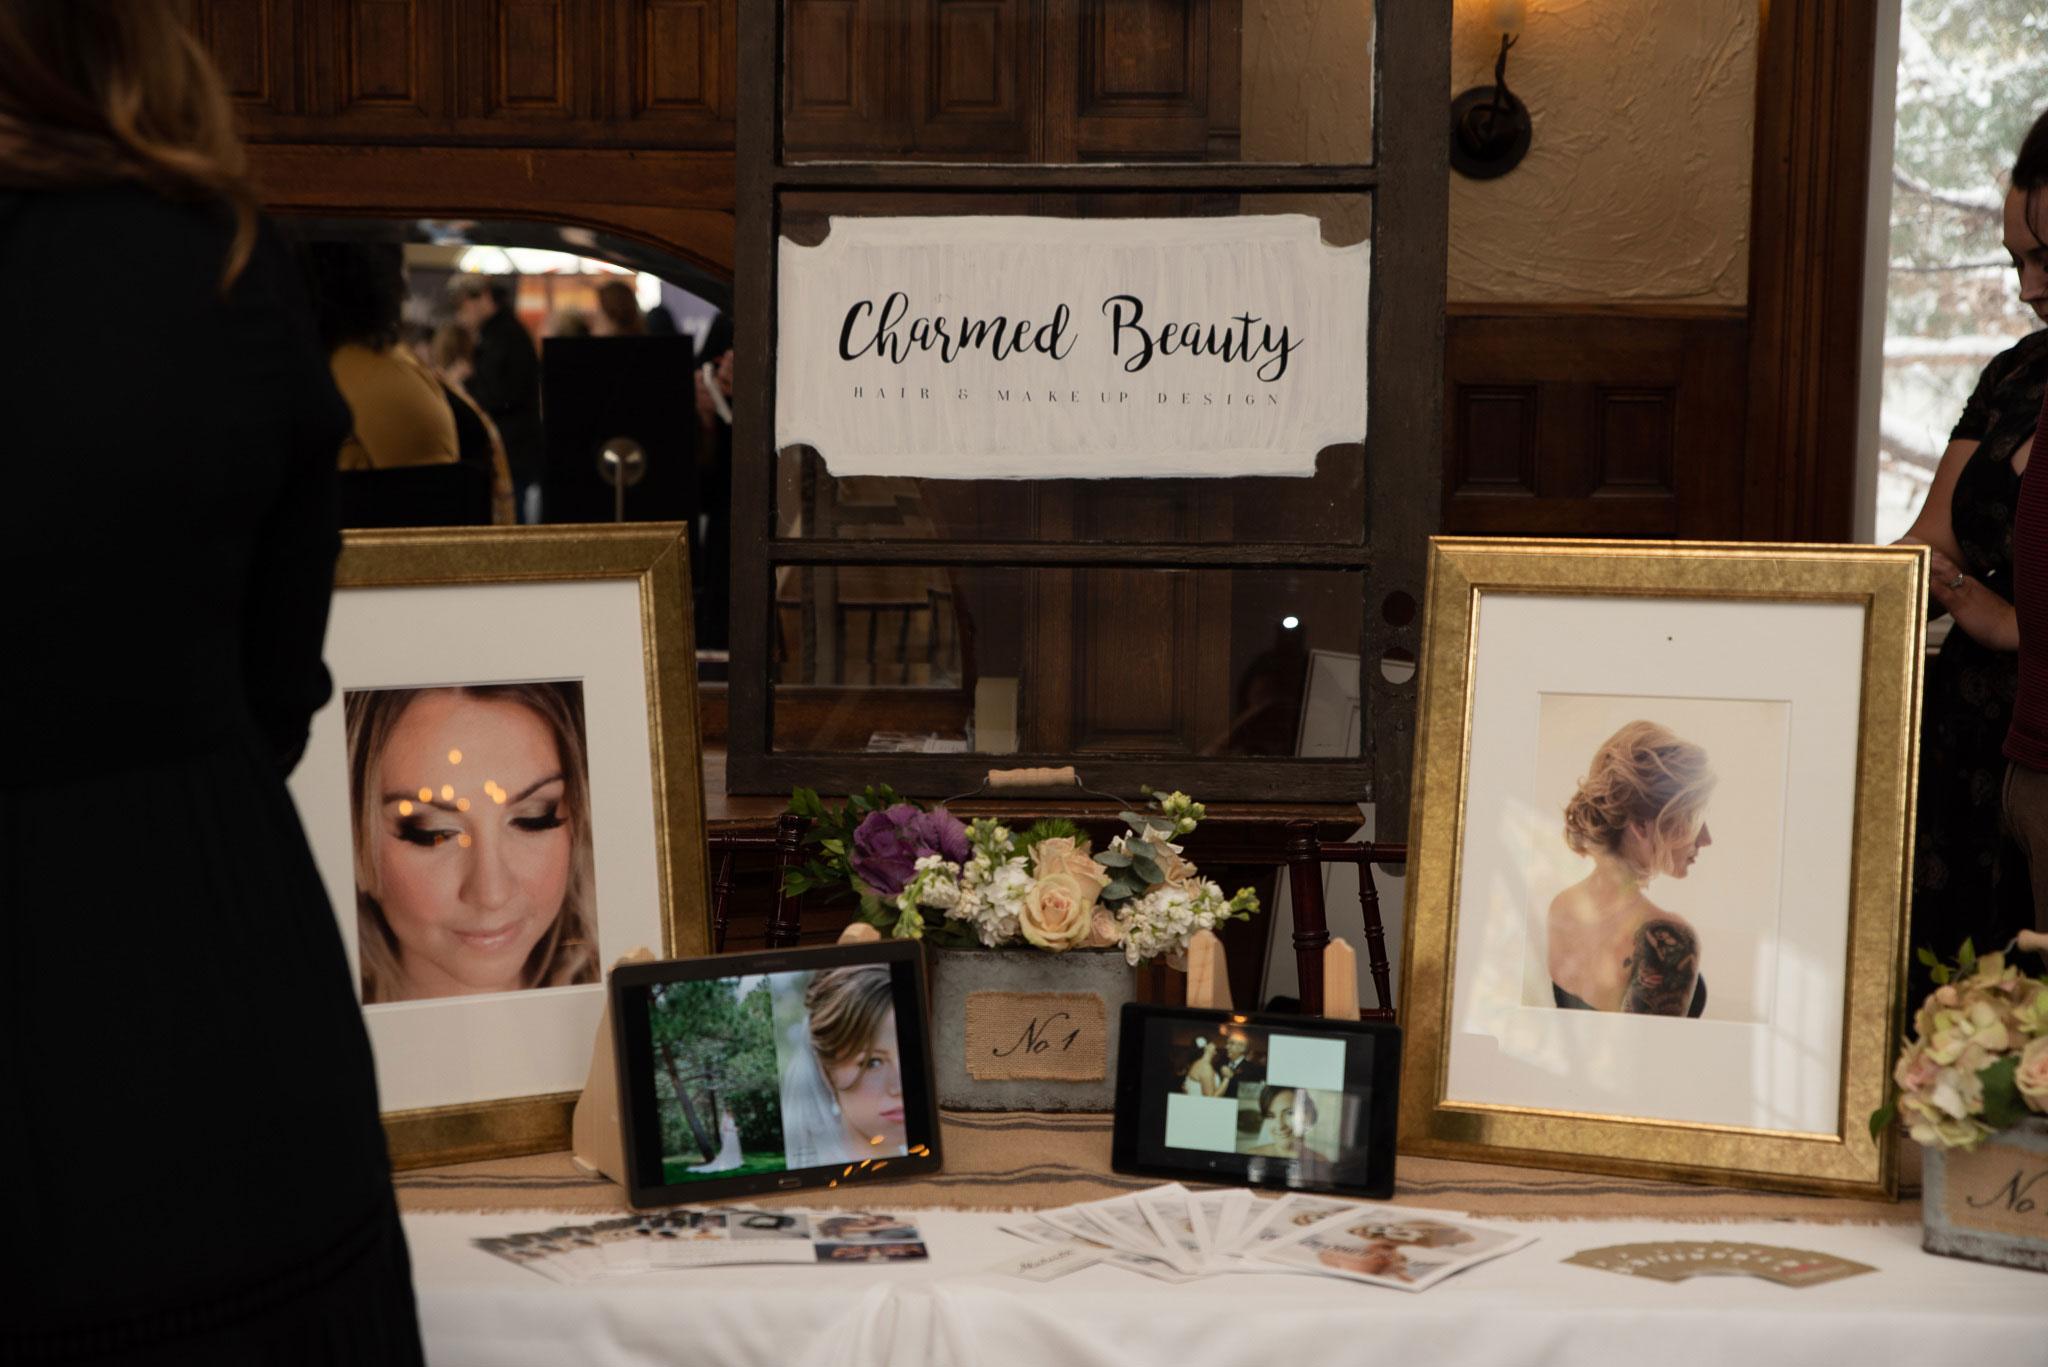 Charmed Beauty at the Cannabis Wedding Expo in Denver, Colorado. Photo by Kenesha Facello